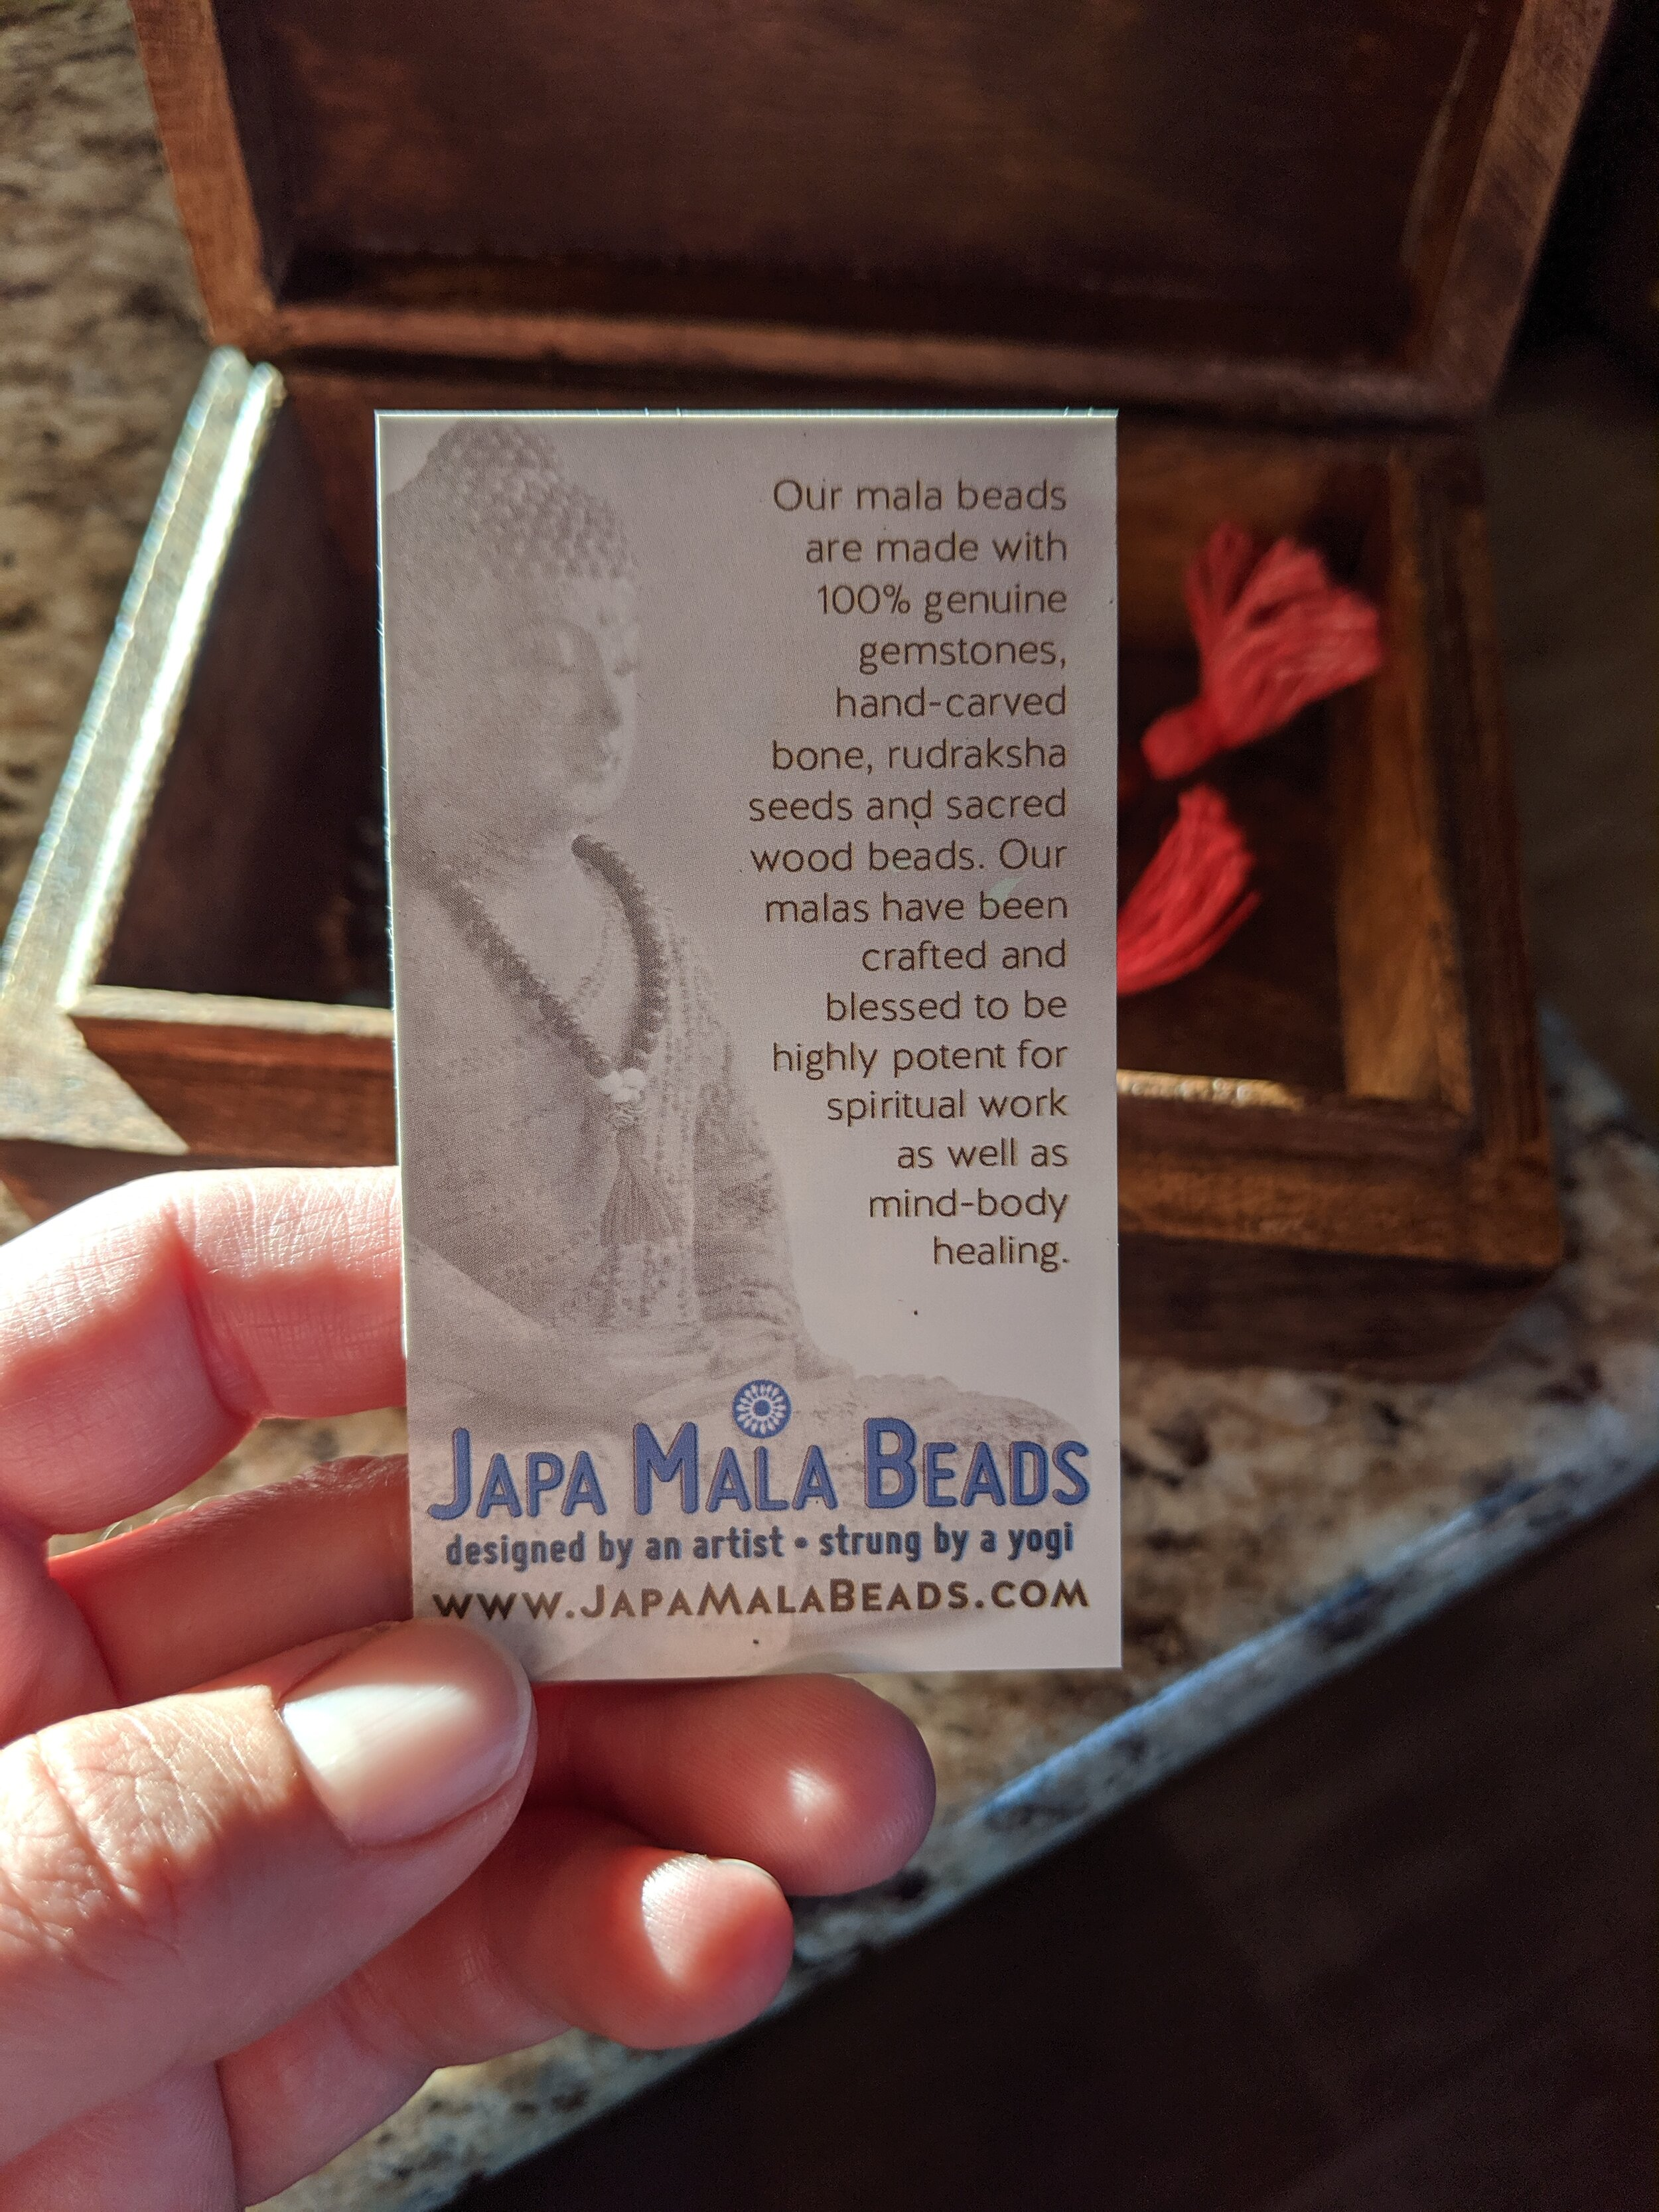 Alive in the Fire_Japa Mala Beads (7).jpg